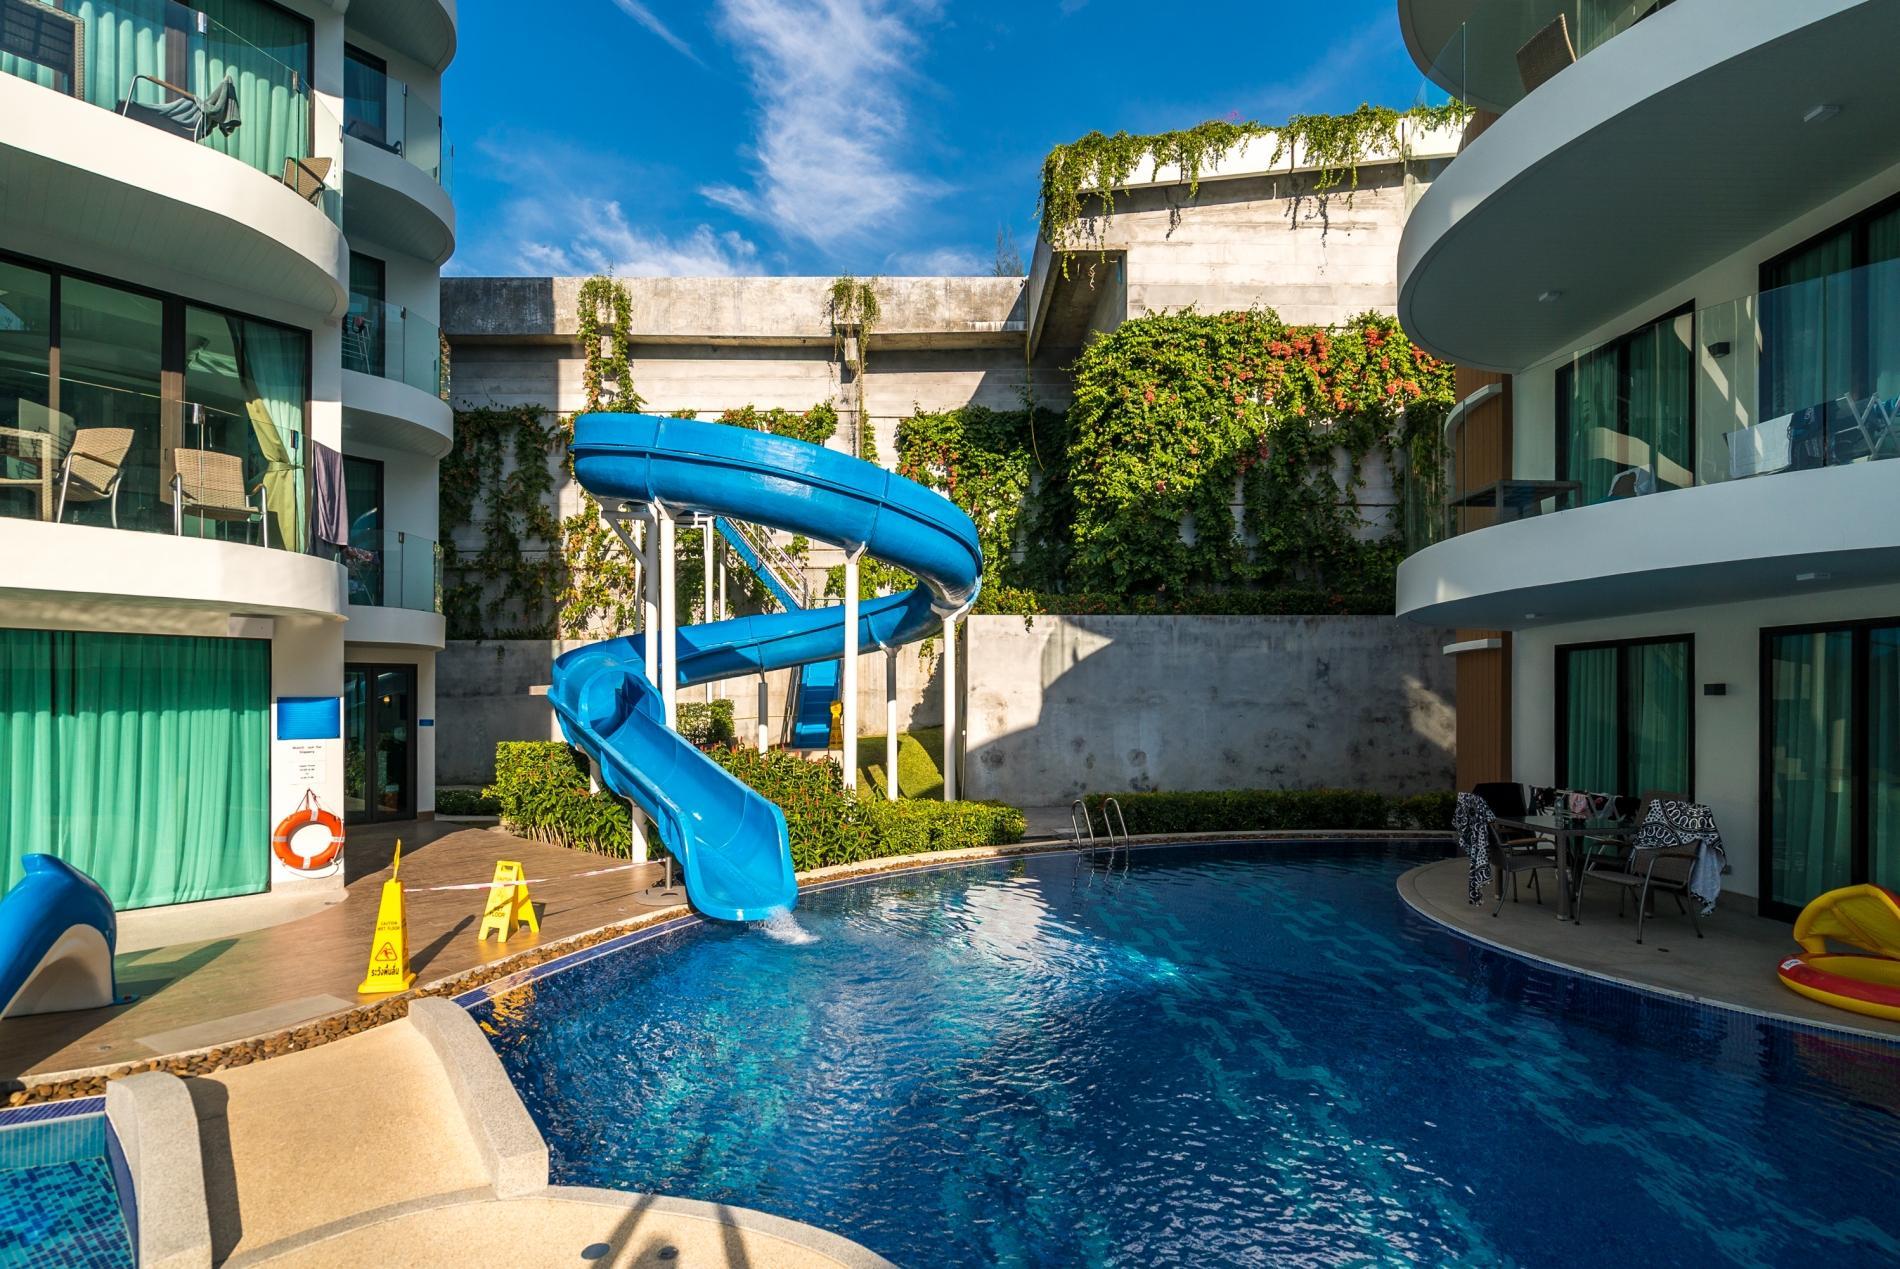 Apartment Twin Sands 1406 - Panoramic seaview apartment walk to beach  shared pool photo 16754764